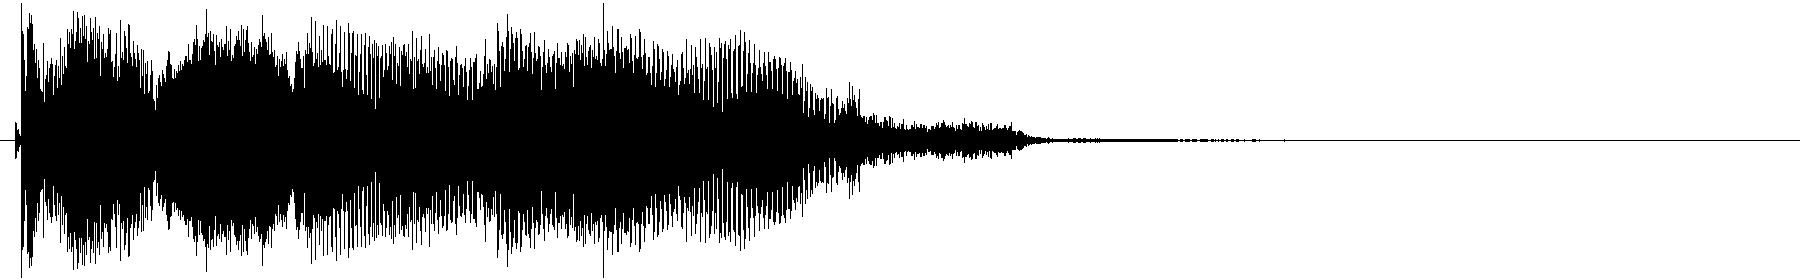 001 female